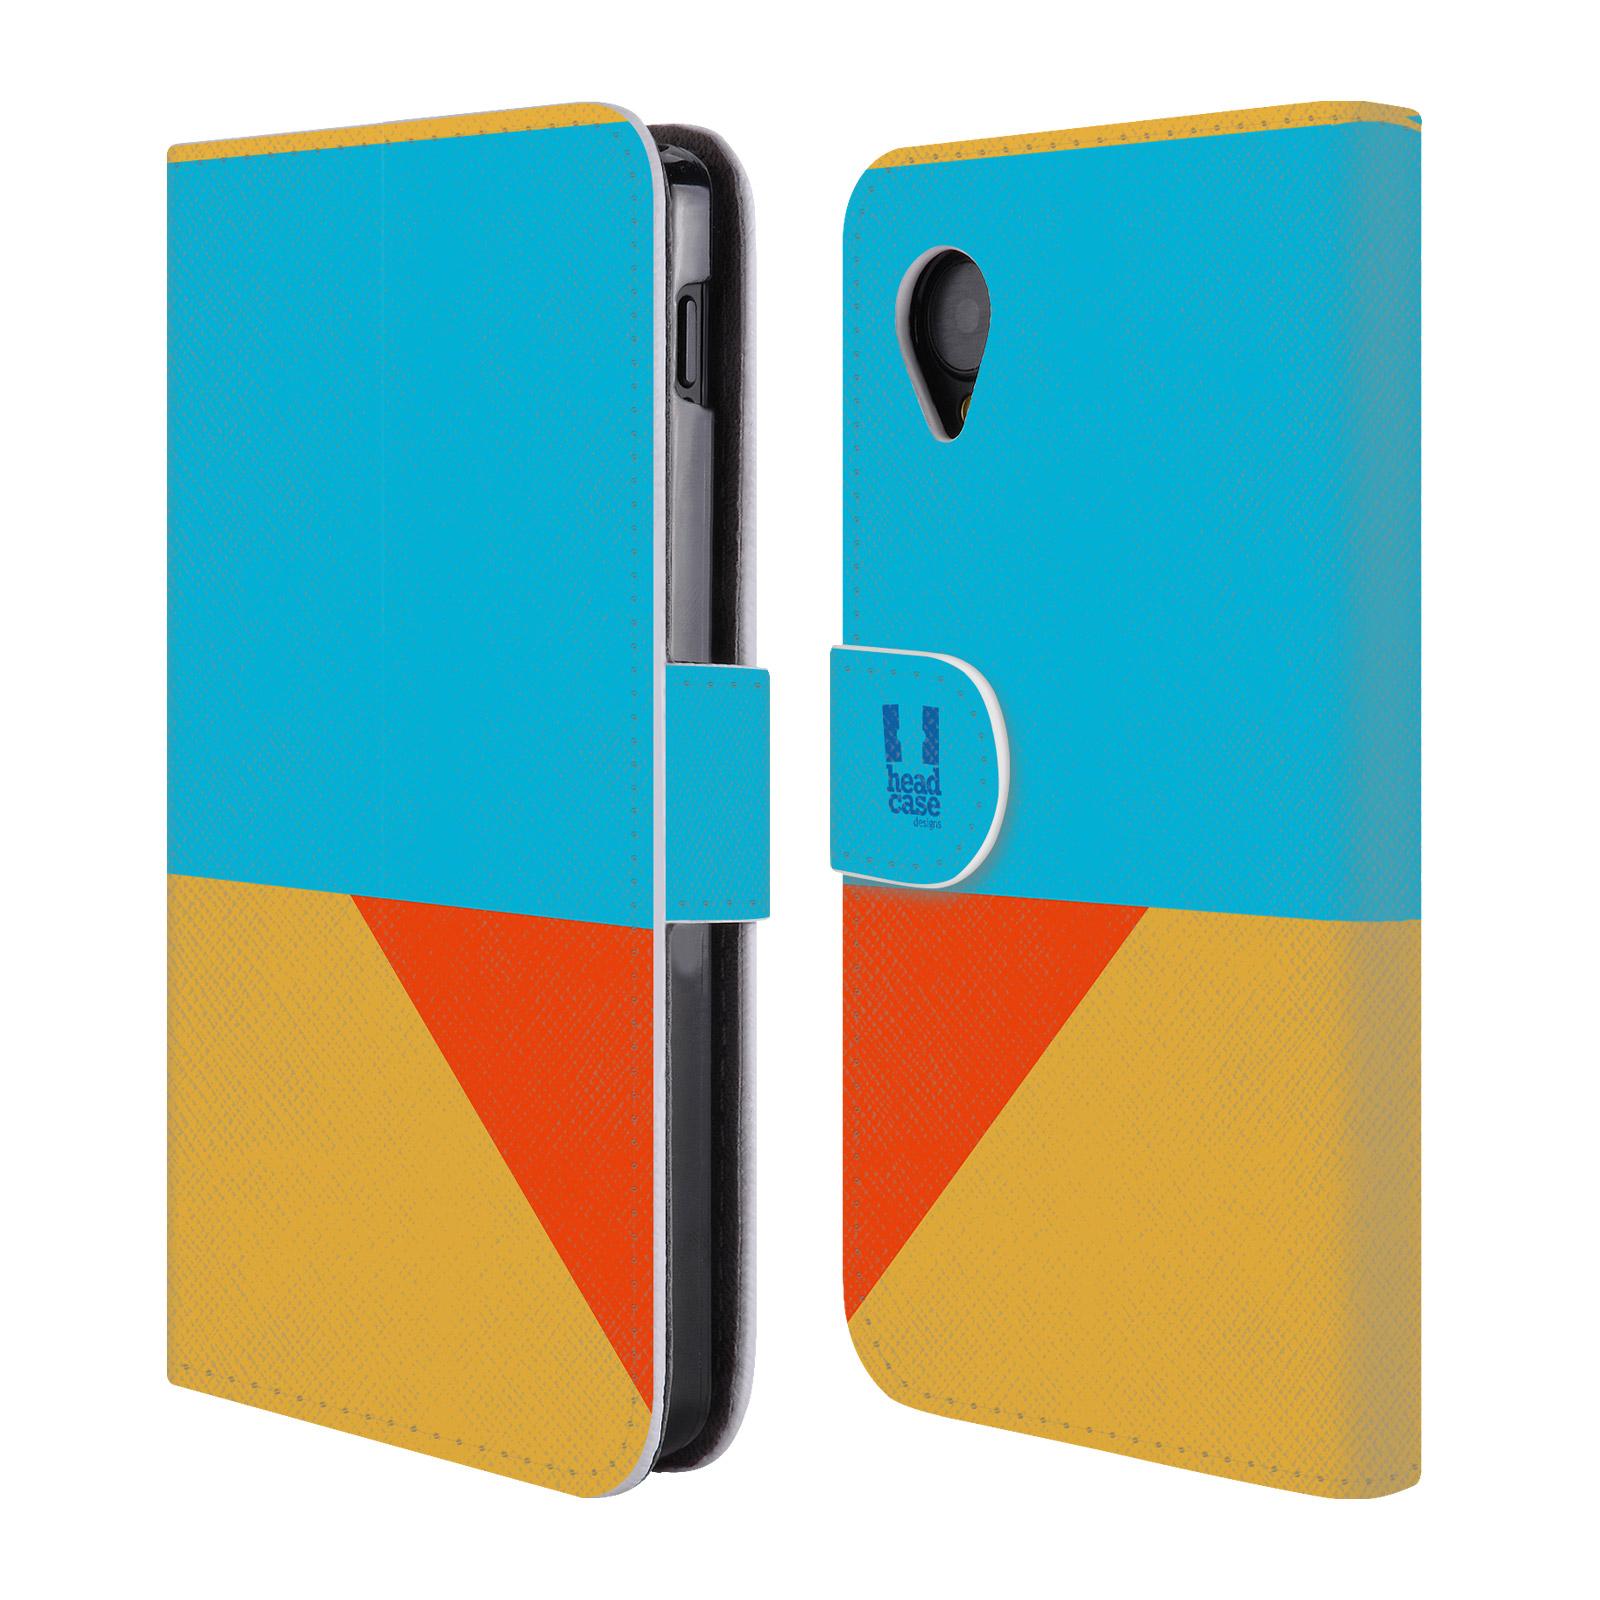 HEAD CASE Flipové pouzdro pro mobil LG GOOGLE NEXUS 5 barevné tvary béžová a modrá DAY WEAR